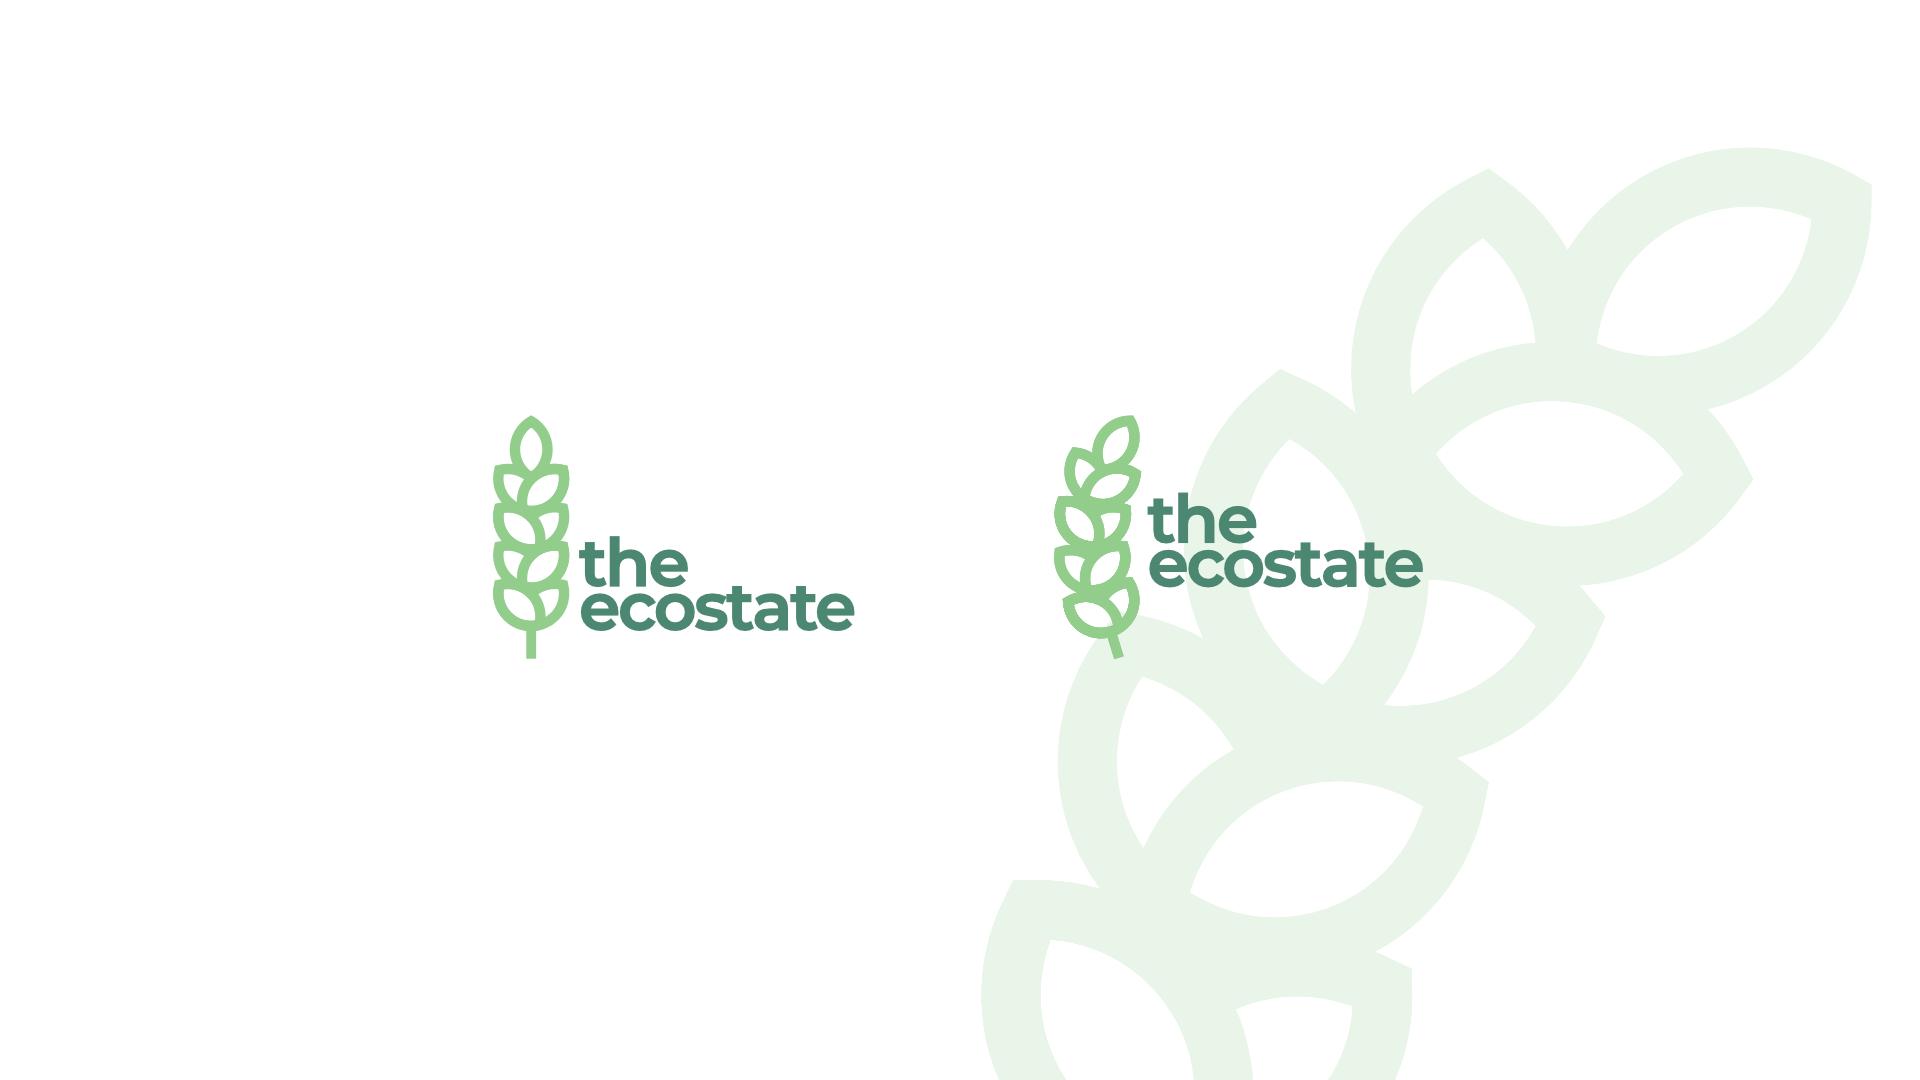 ecostate_logo_showcase.png